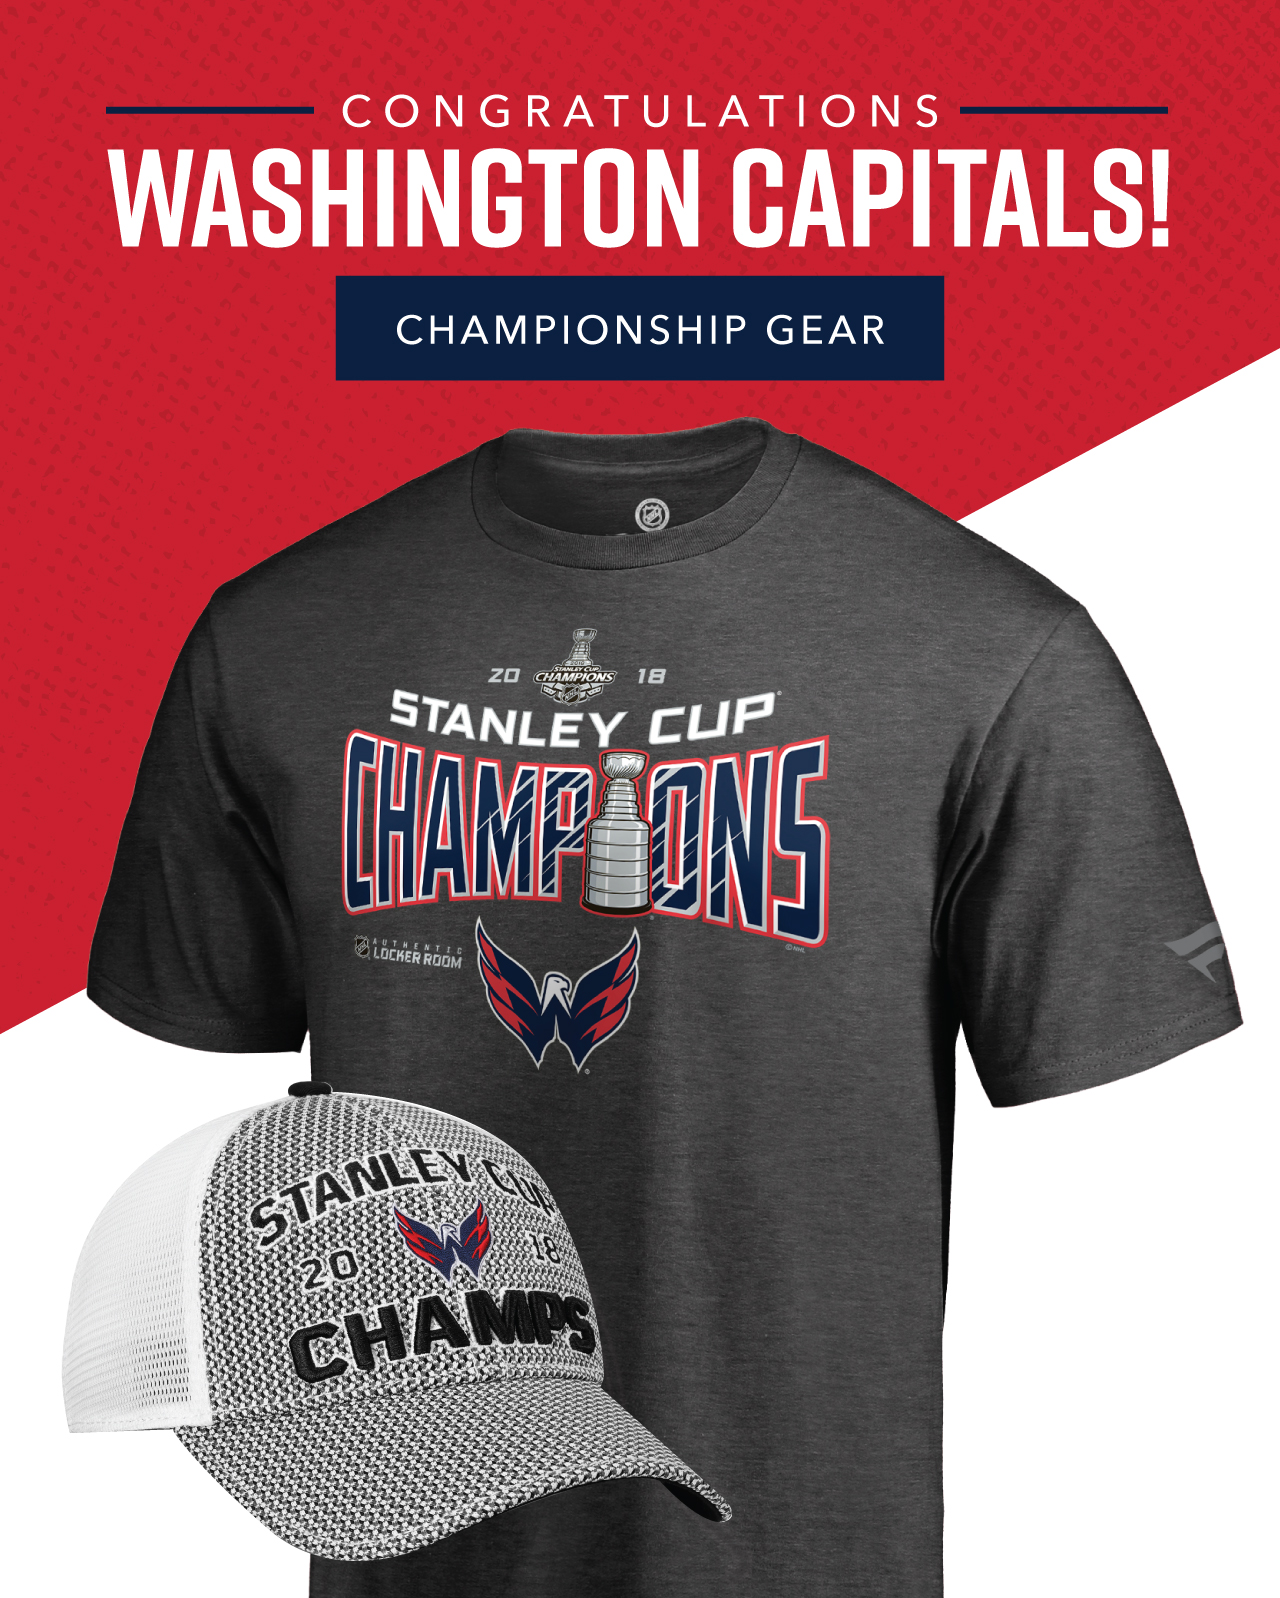 79513497fef Pure Hockey: Congratulations To The Washington Capitals! | Milled